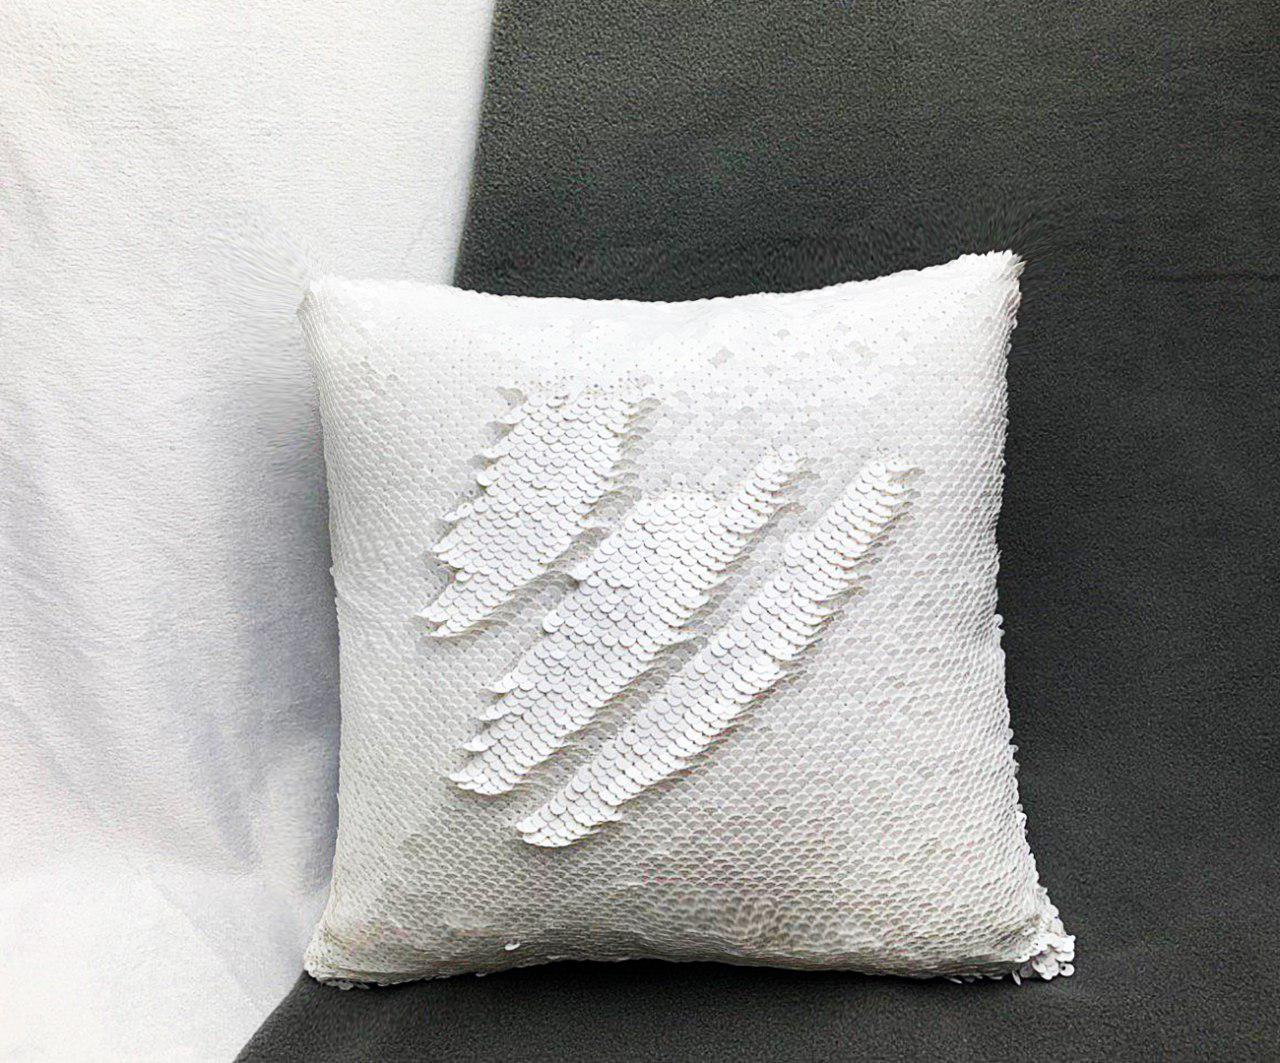 Подушка БЕЛАЯ с пайетками под сублимацию ХАМЕЛЕОН 35х35см